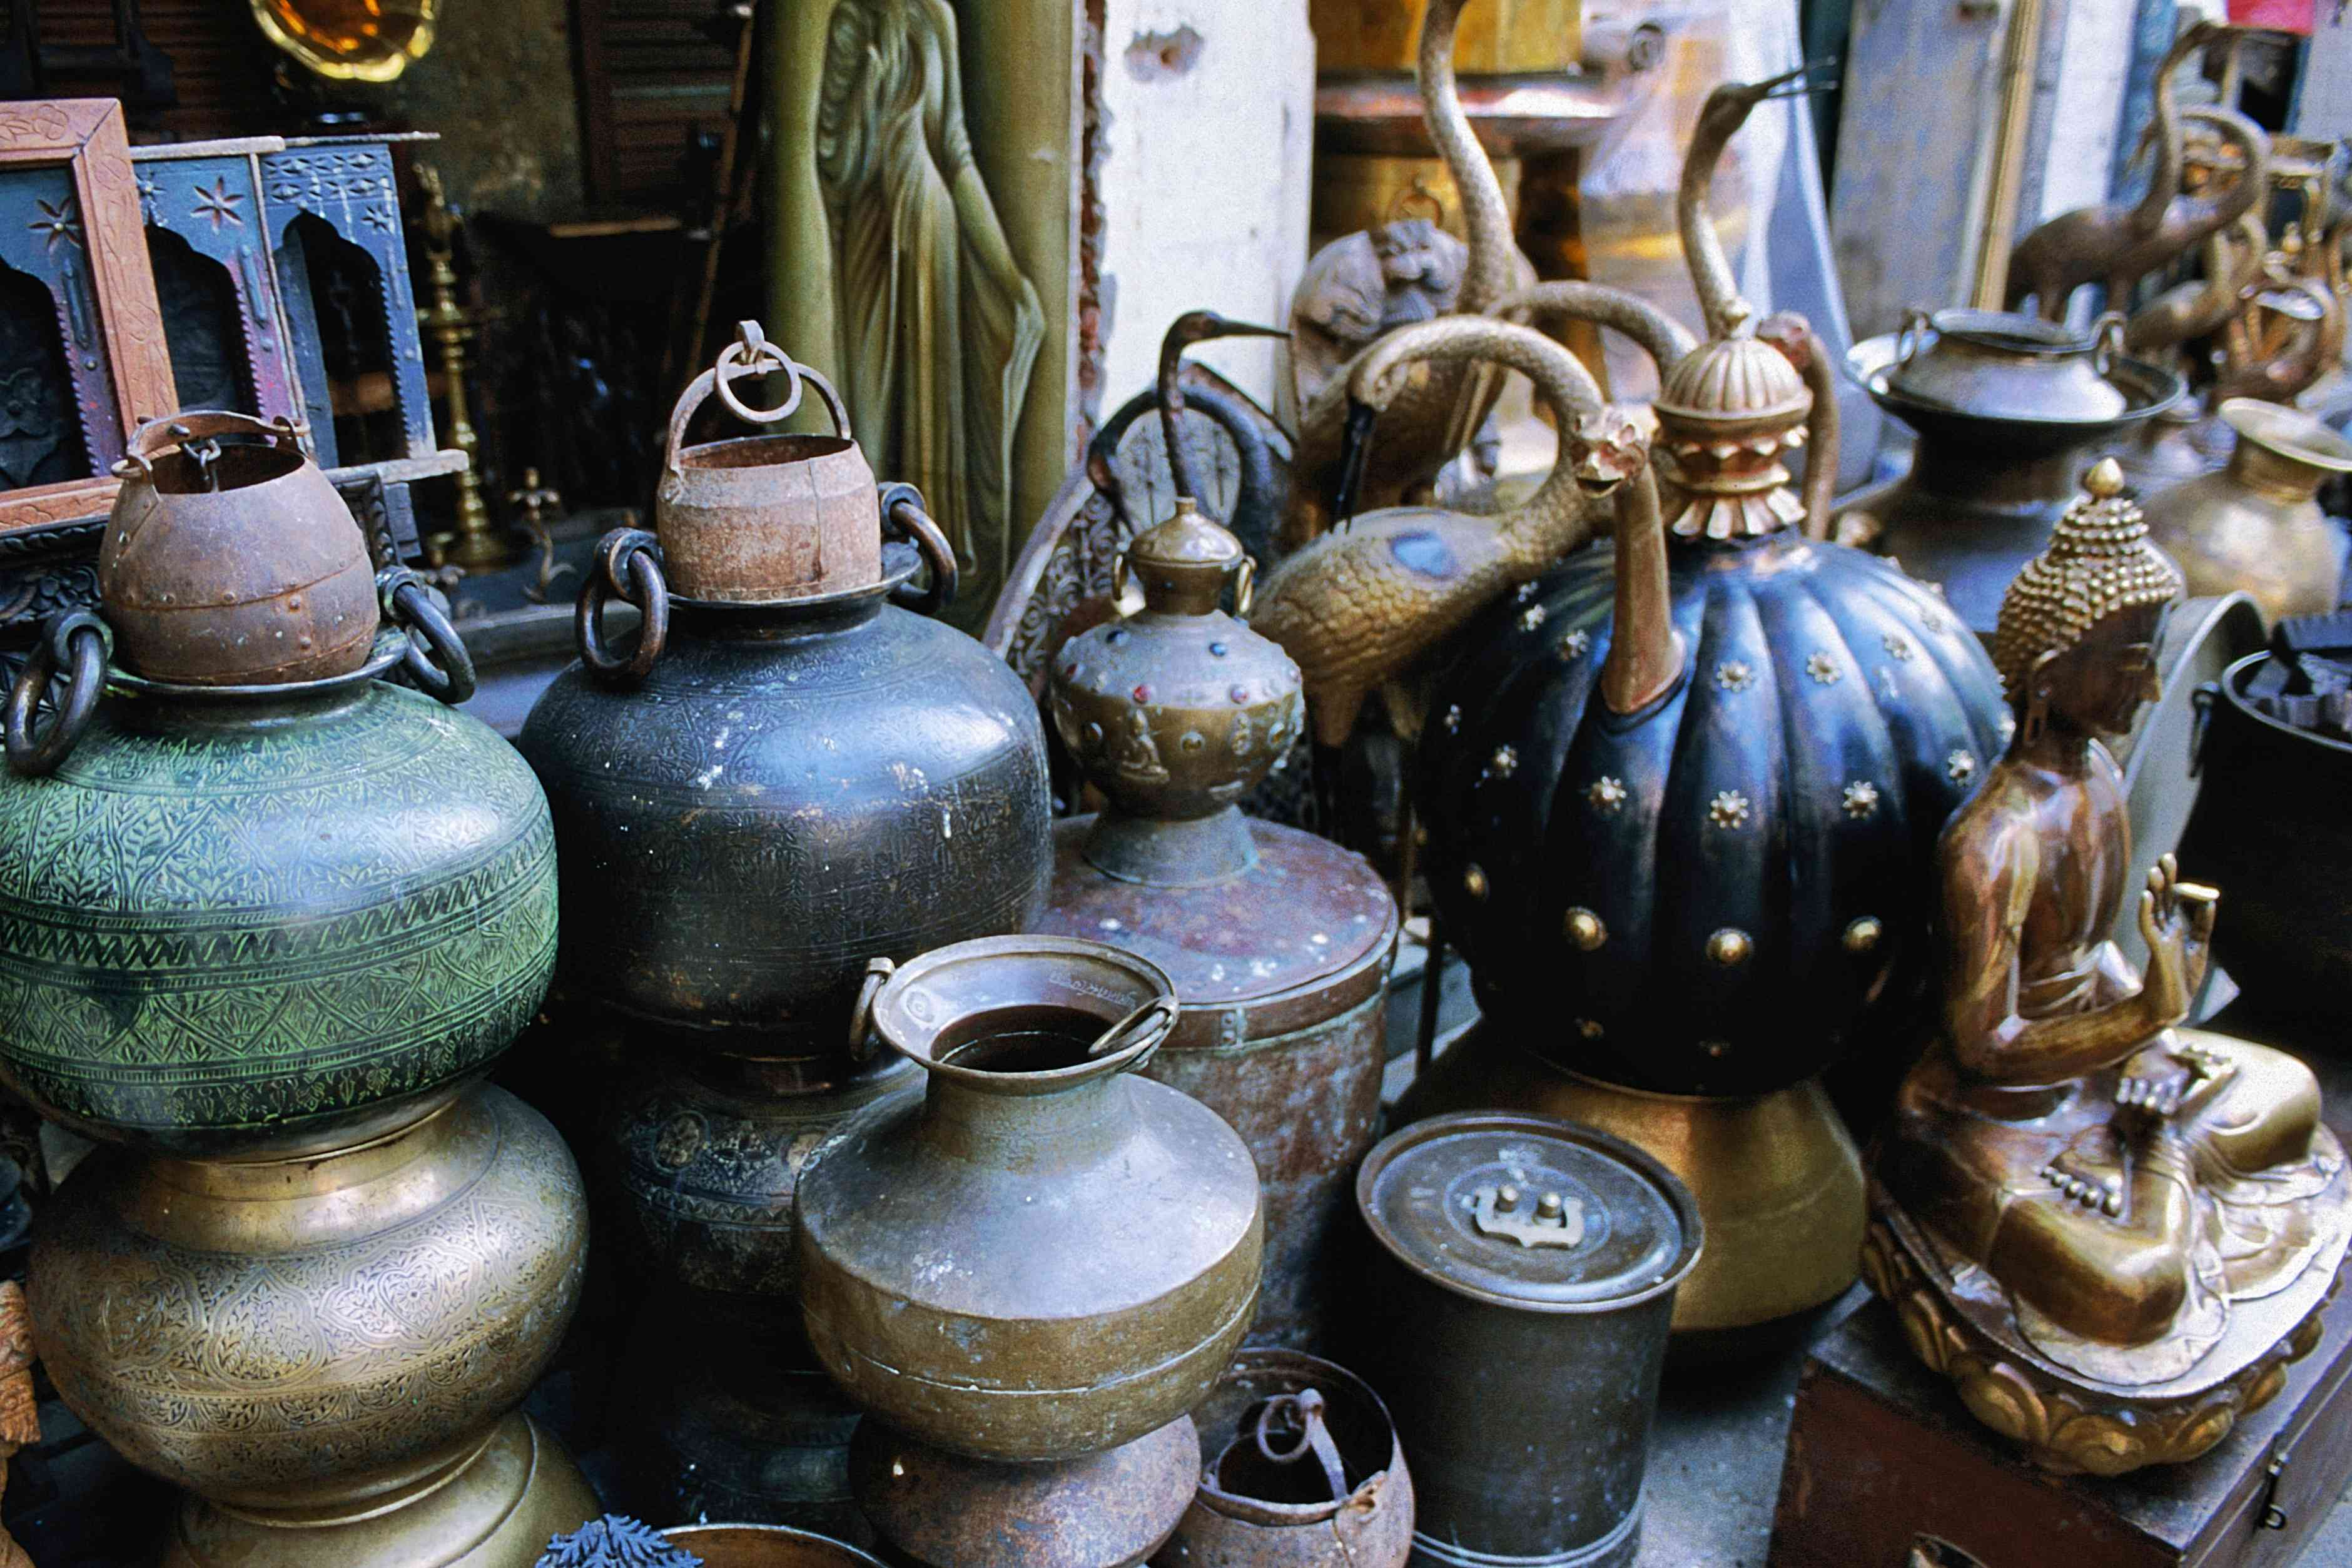 Pots, pans, kettles and a small Buddha for sale in Sundar Nagar, an antique quarter of Delhi.